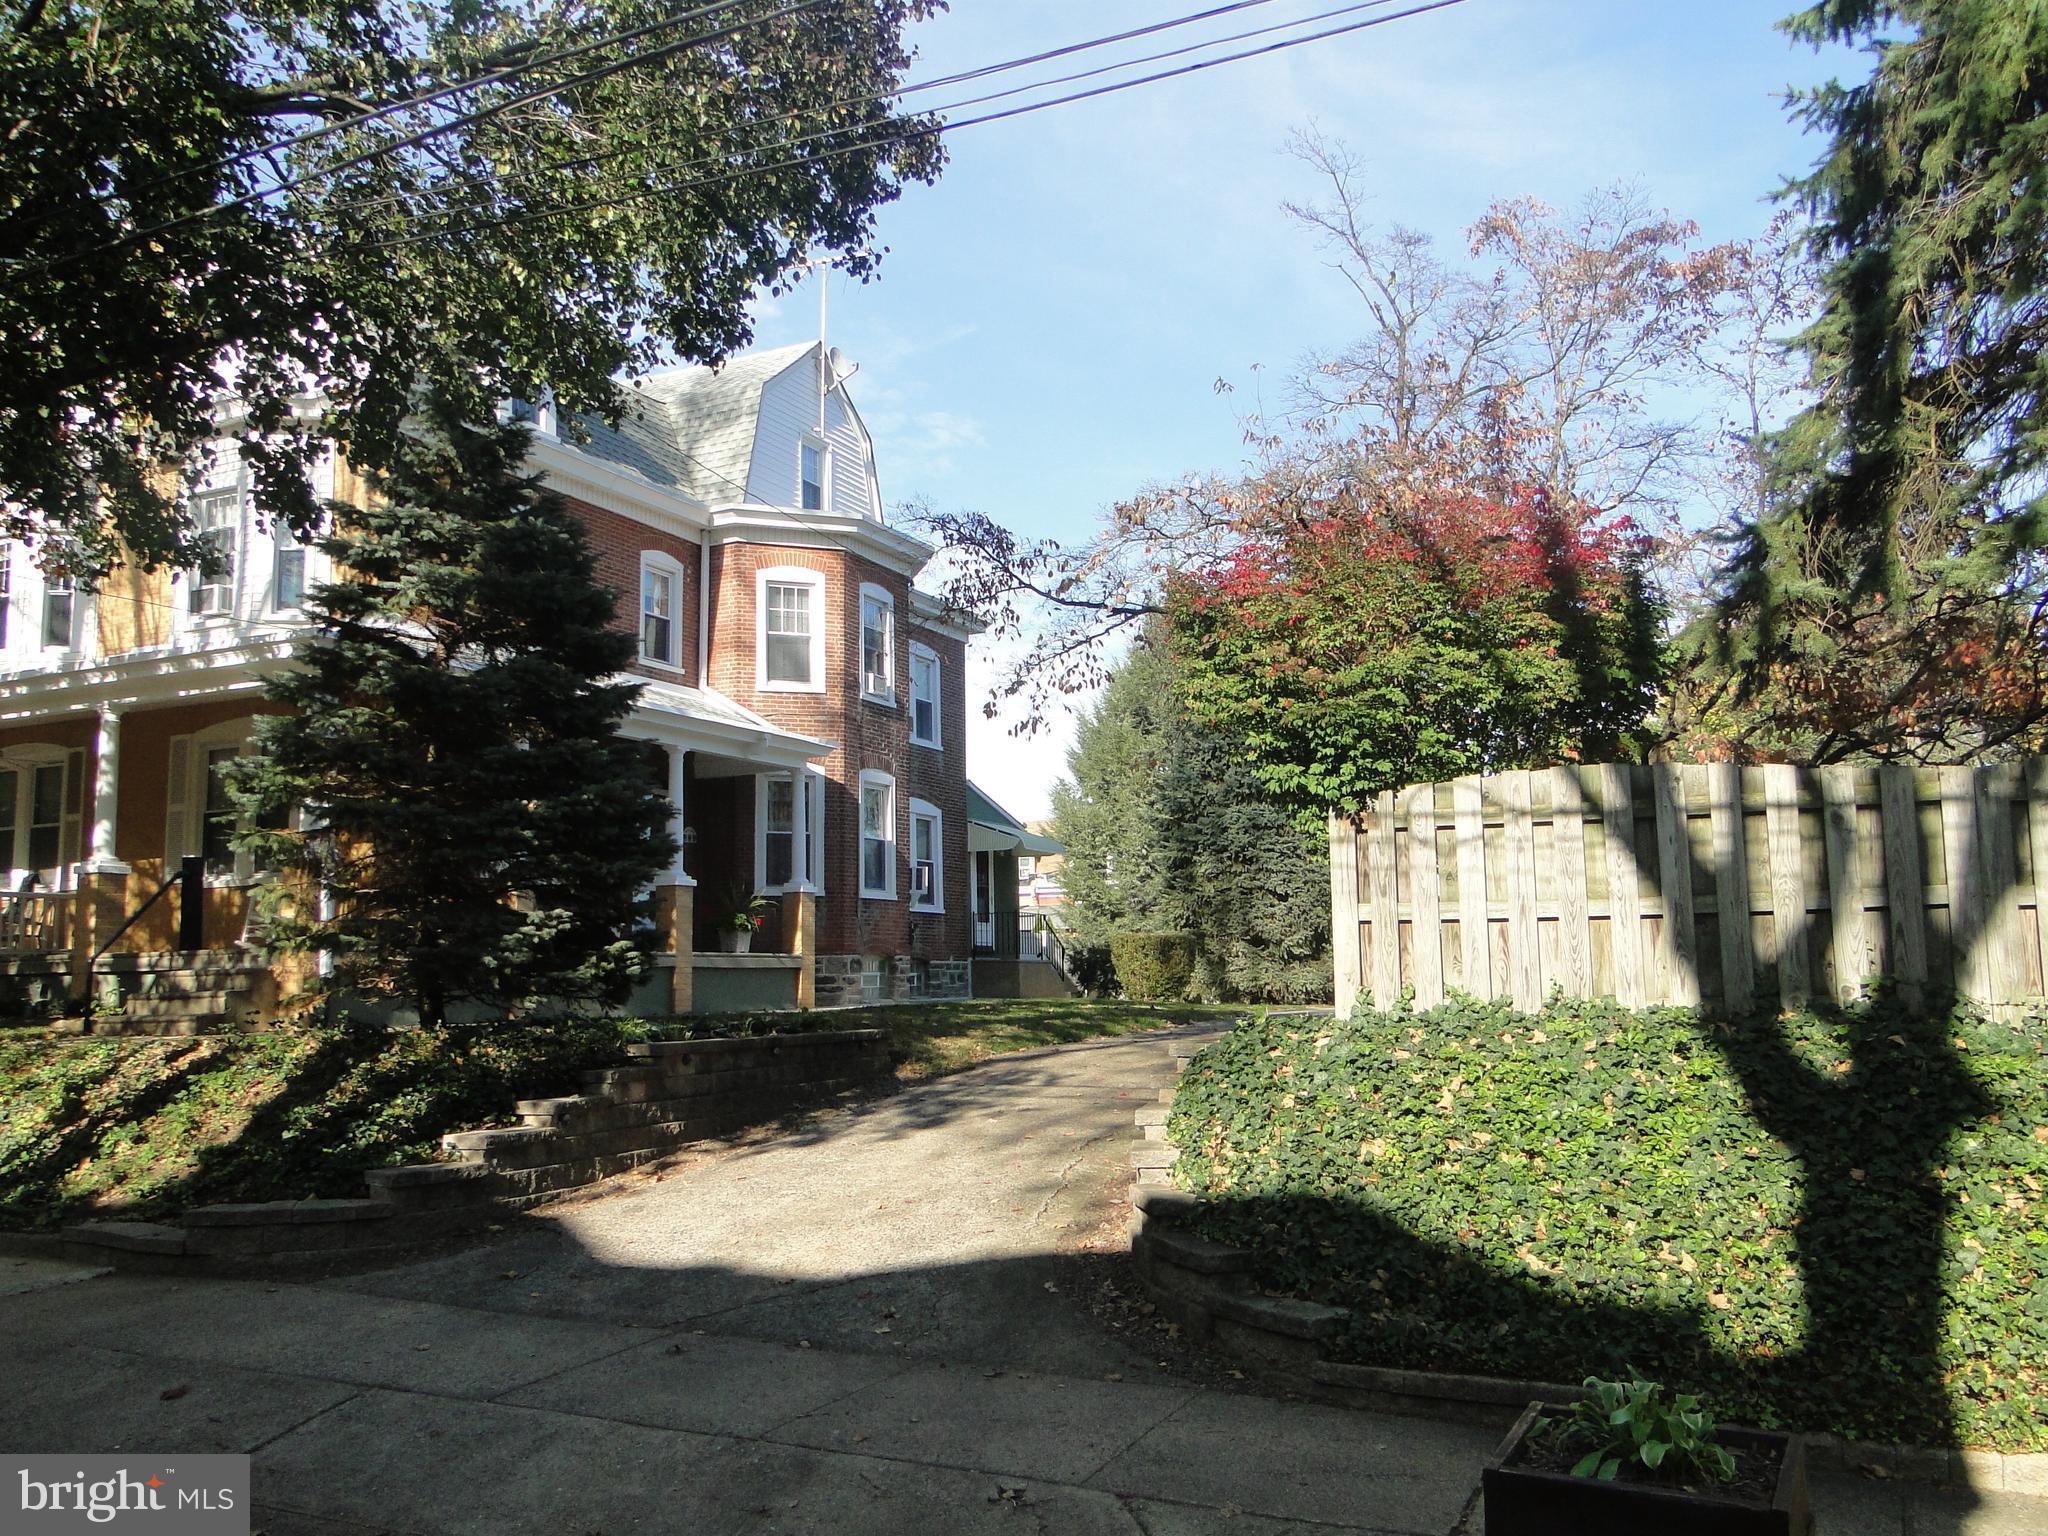 515 ARTHUR STREET, PHILADELPHIA, PA 19111